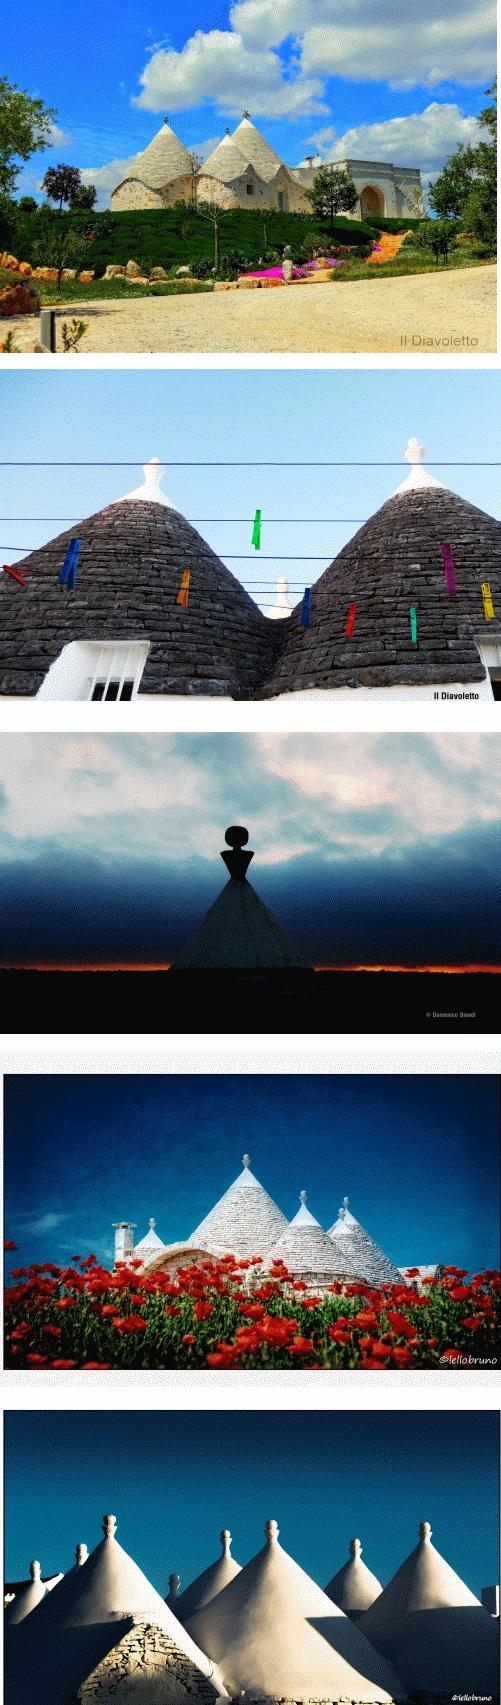 Trulli collage